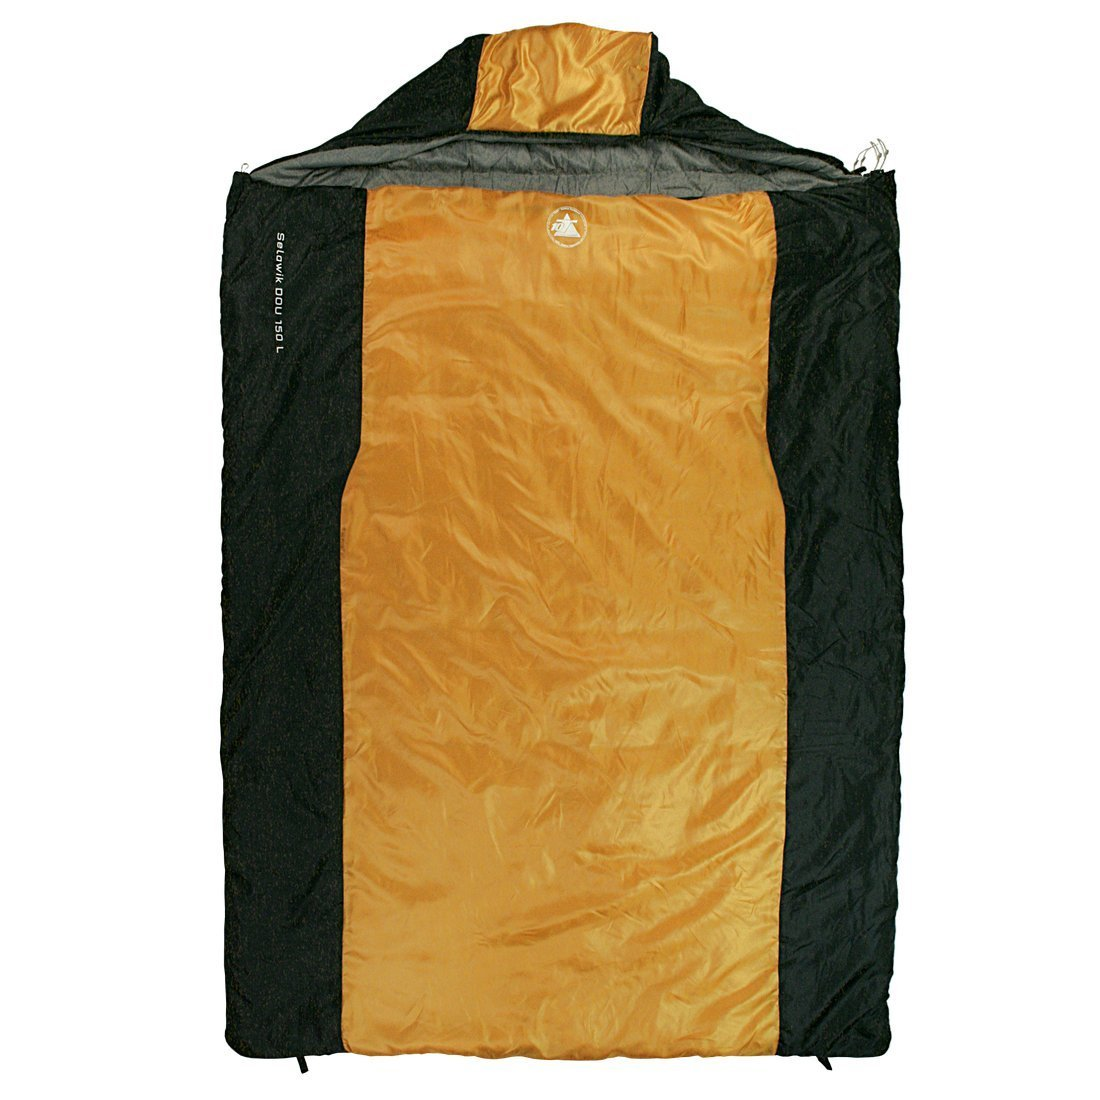 Loftra Schlafsack Comfort Space 230 x 85 x 70 cm Orange//Grau